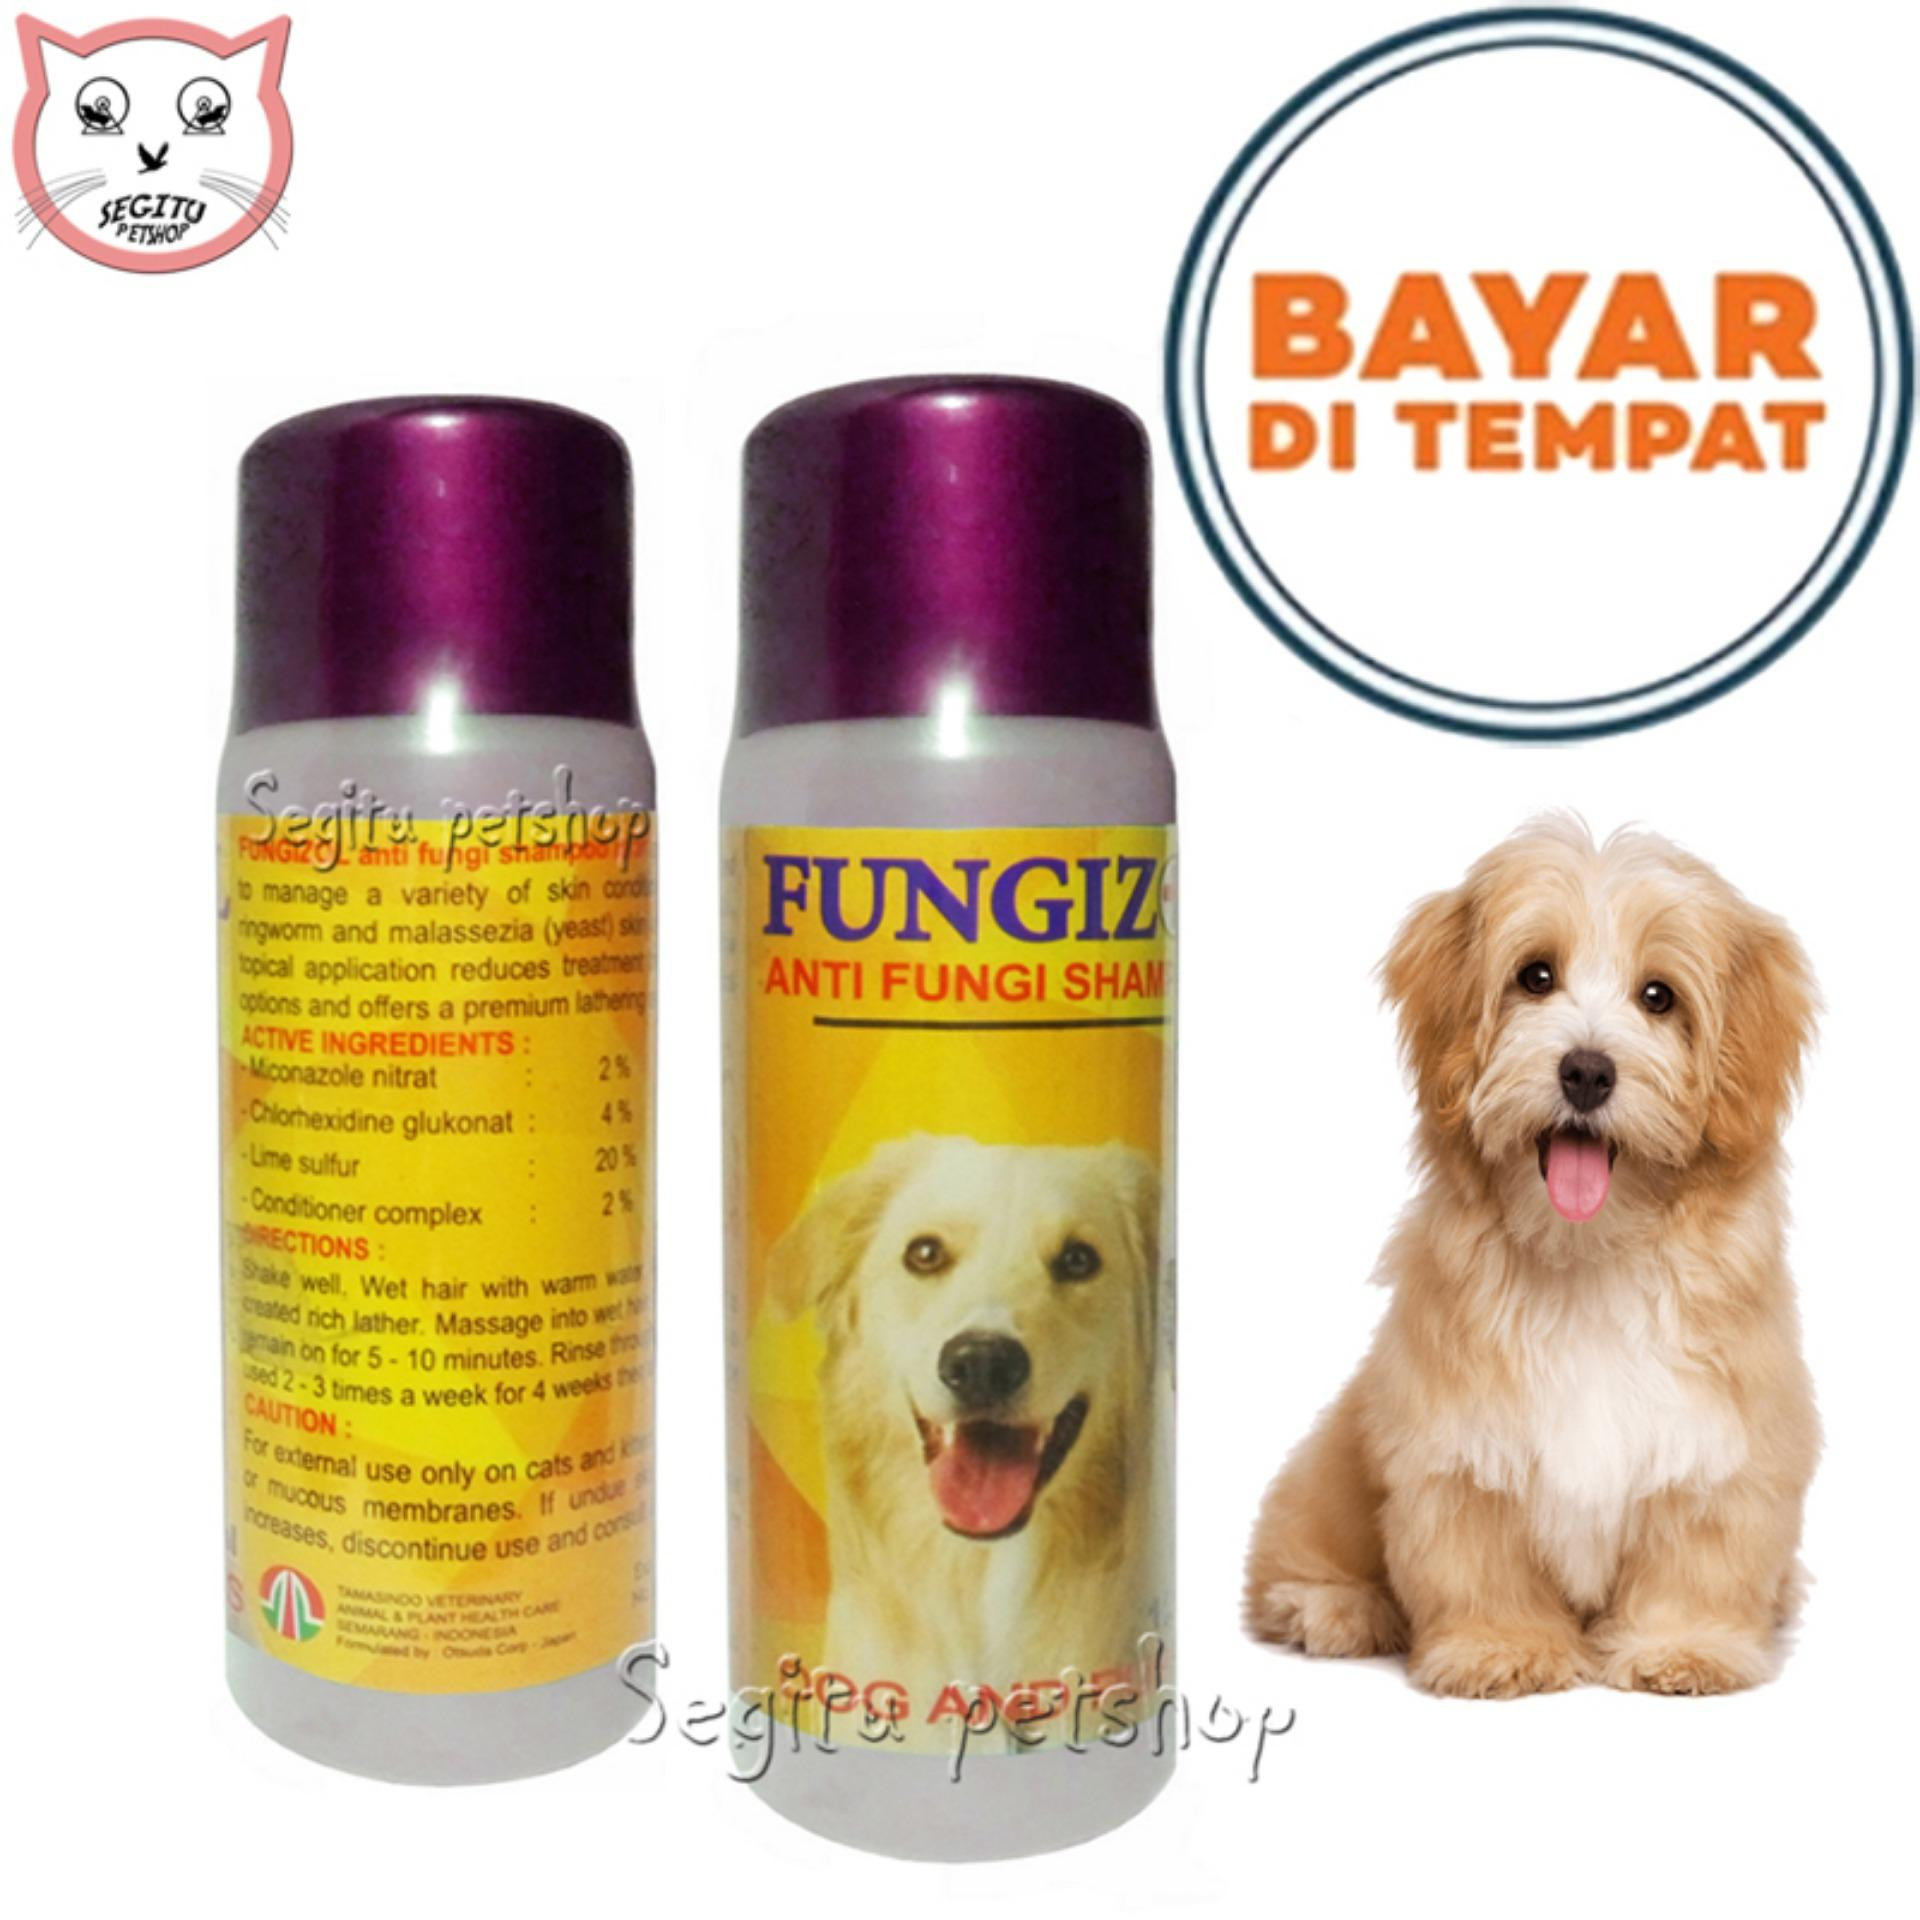 Shampo Anjing Anti Jamur Sampo Scabies Fungizol Dog By Segitu Petshop Jayanti.